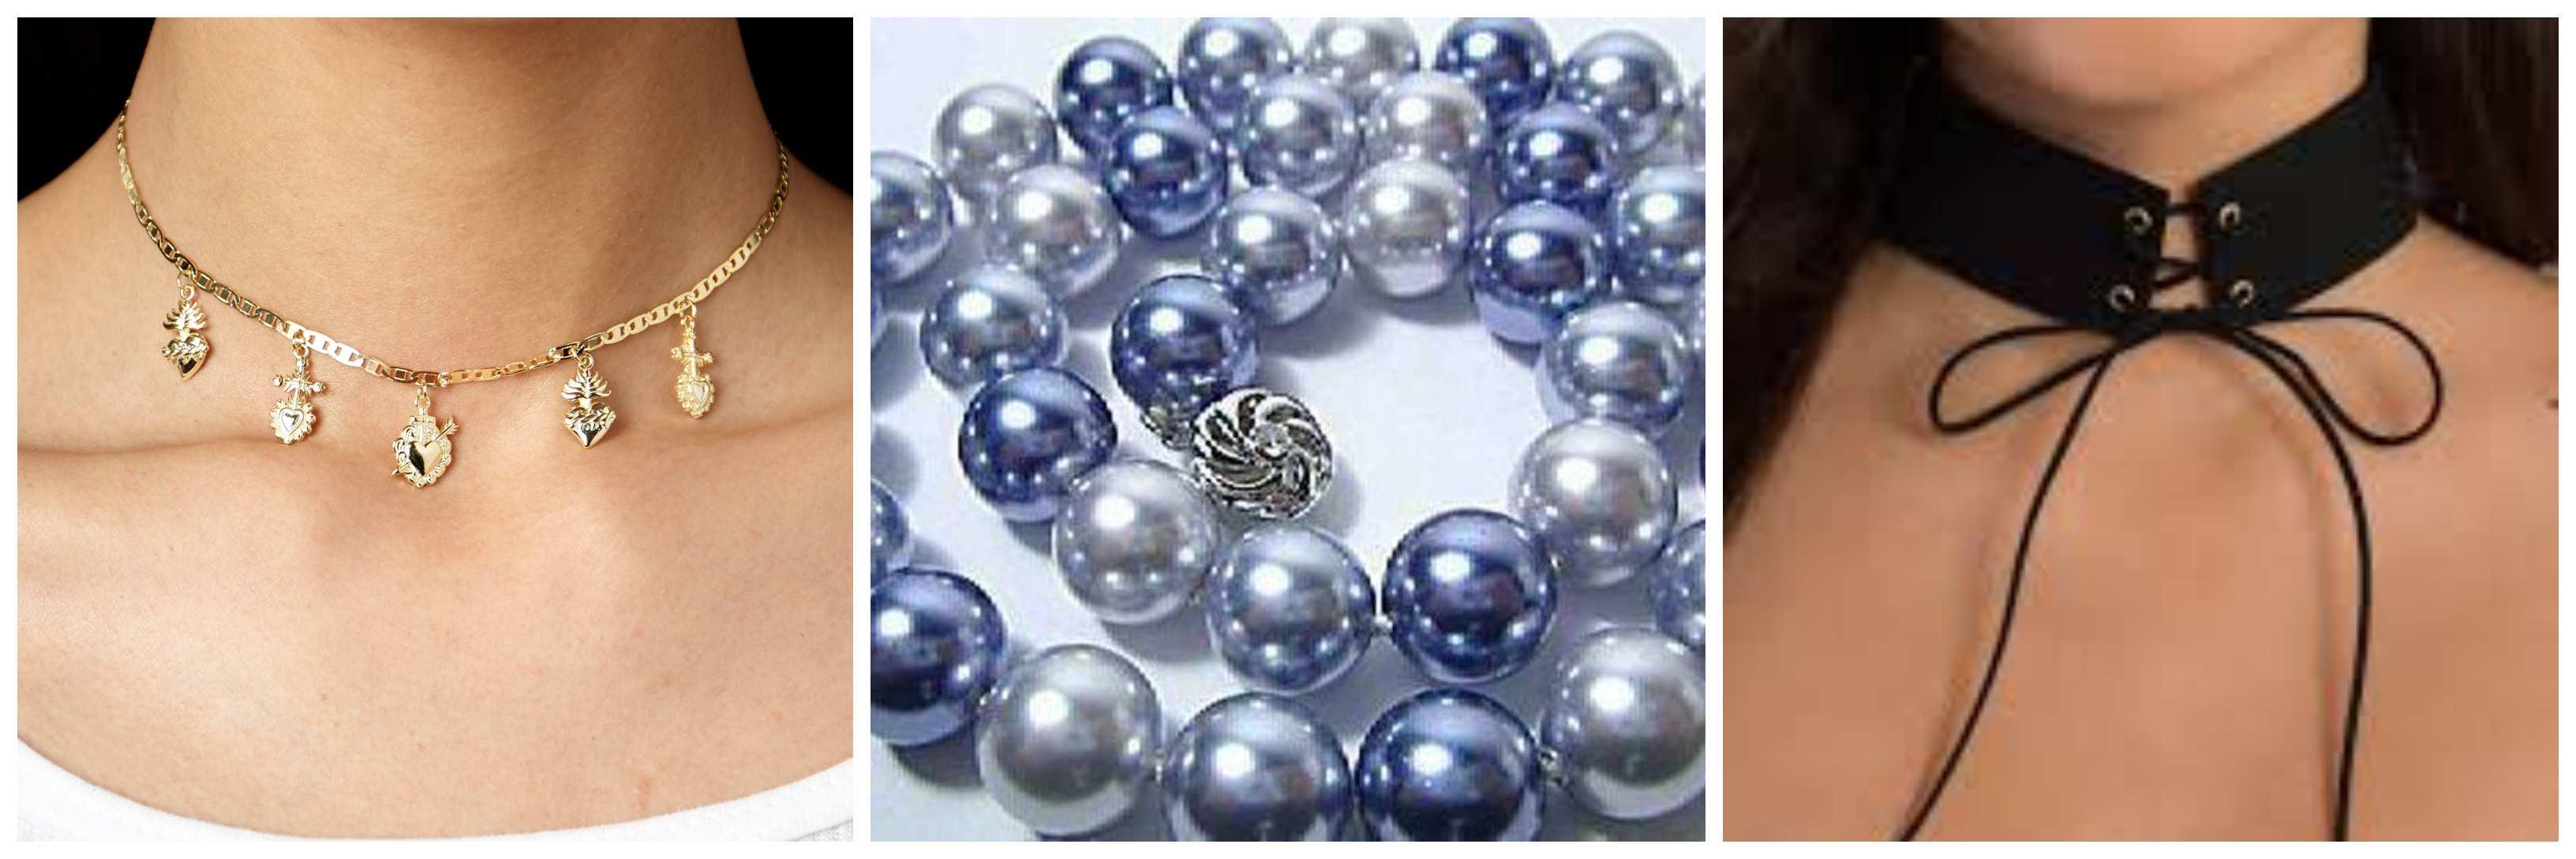 Jewelry Fashion Trends